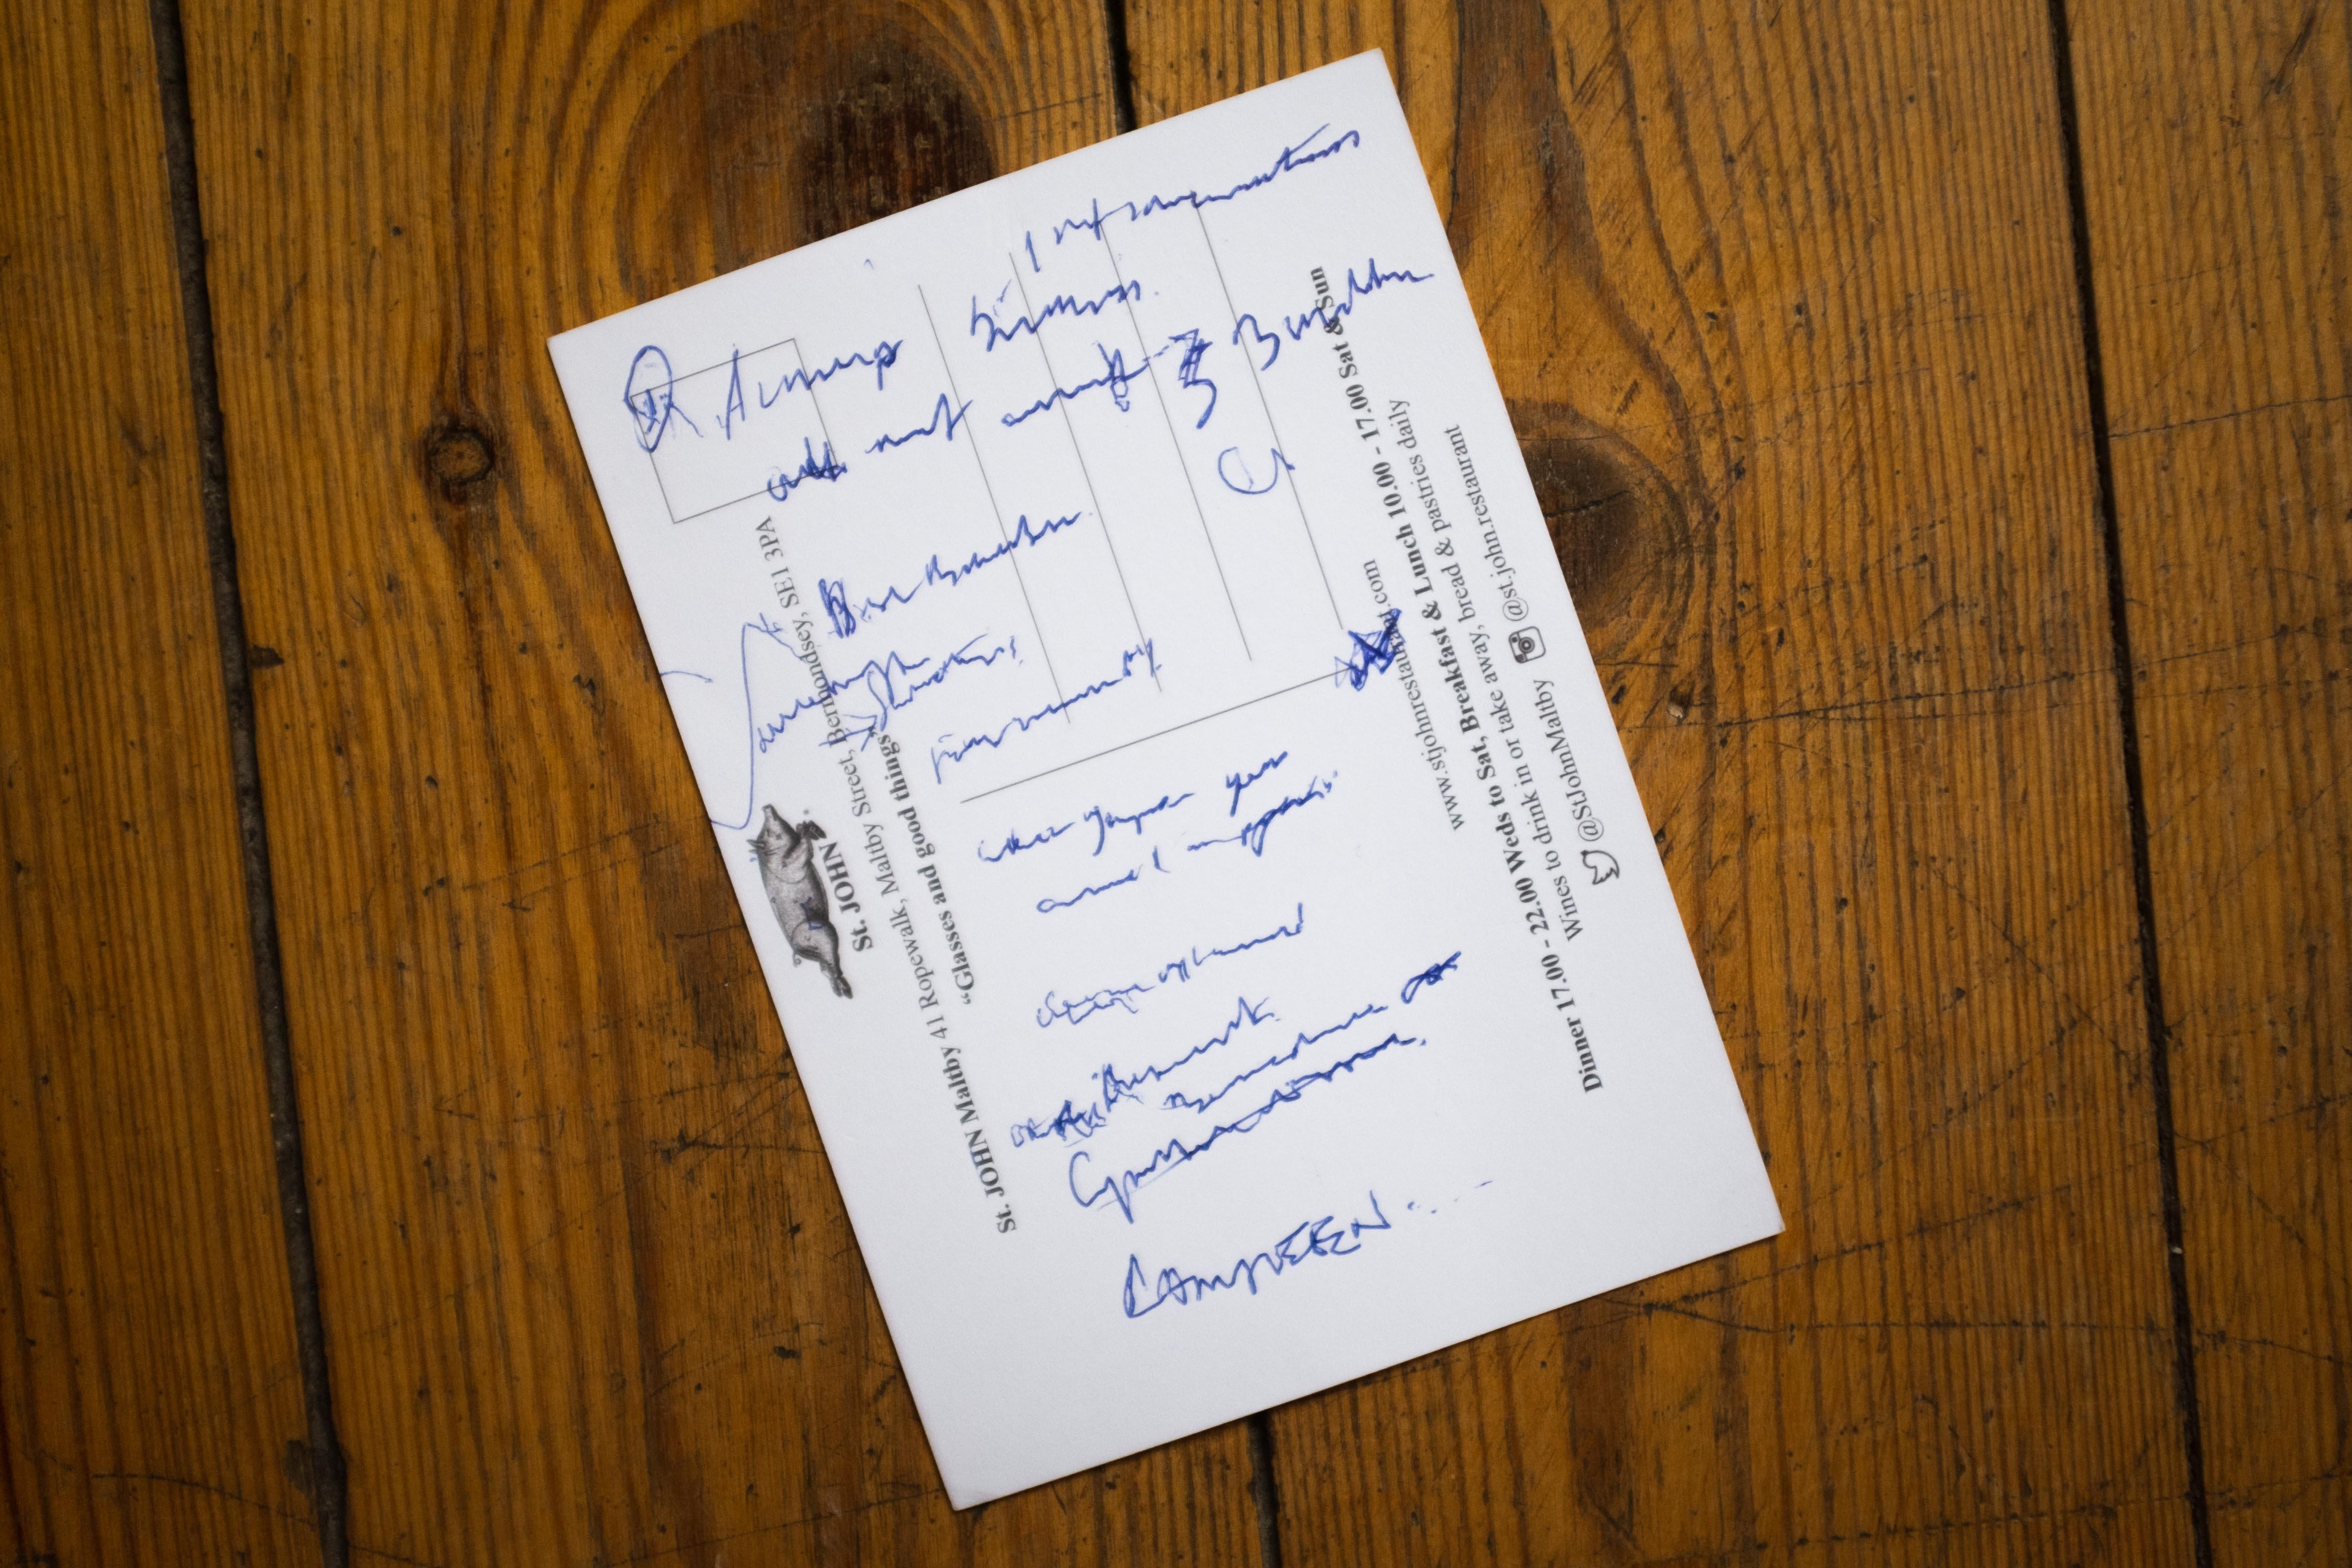 Fergus Henderson hand-written note